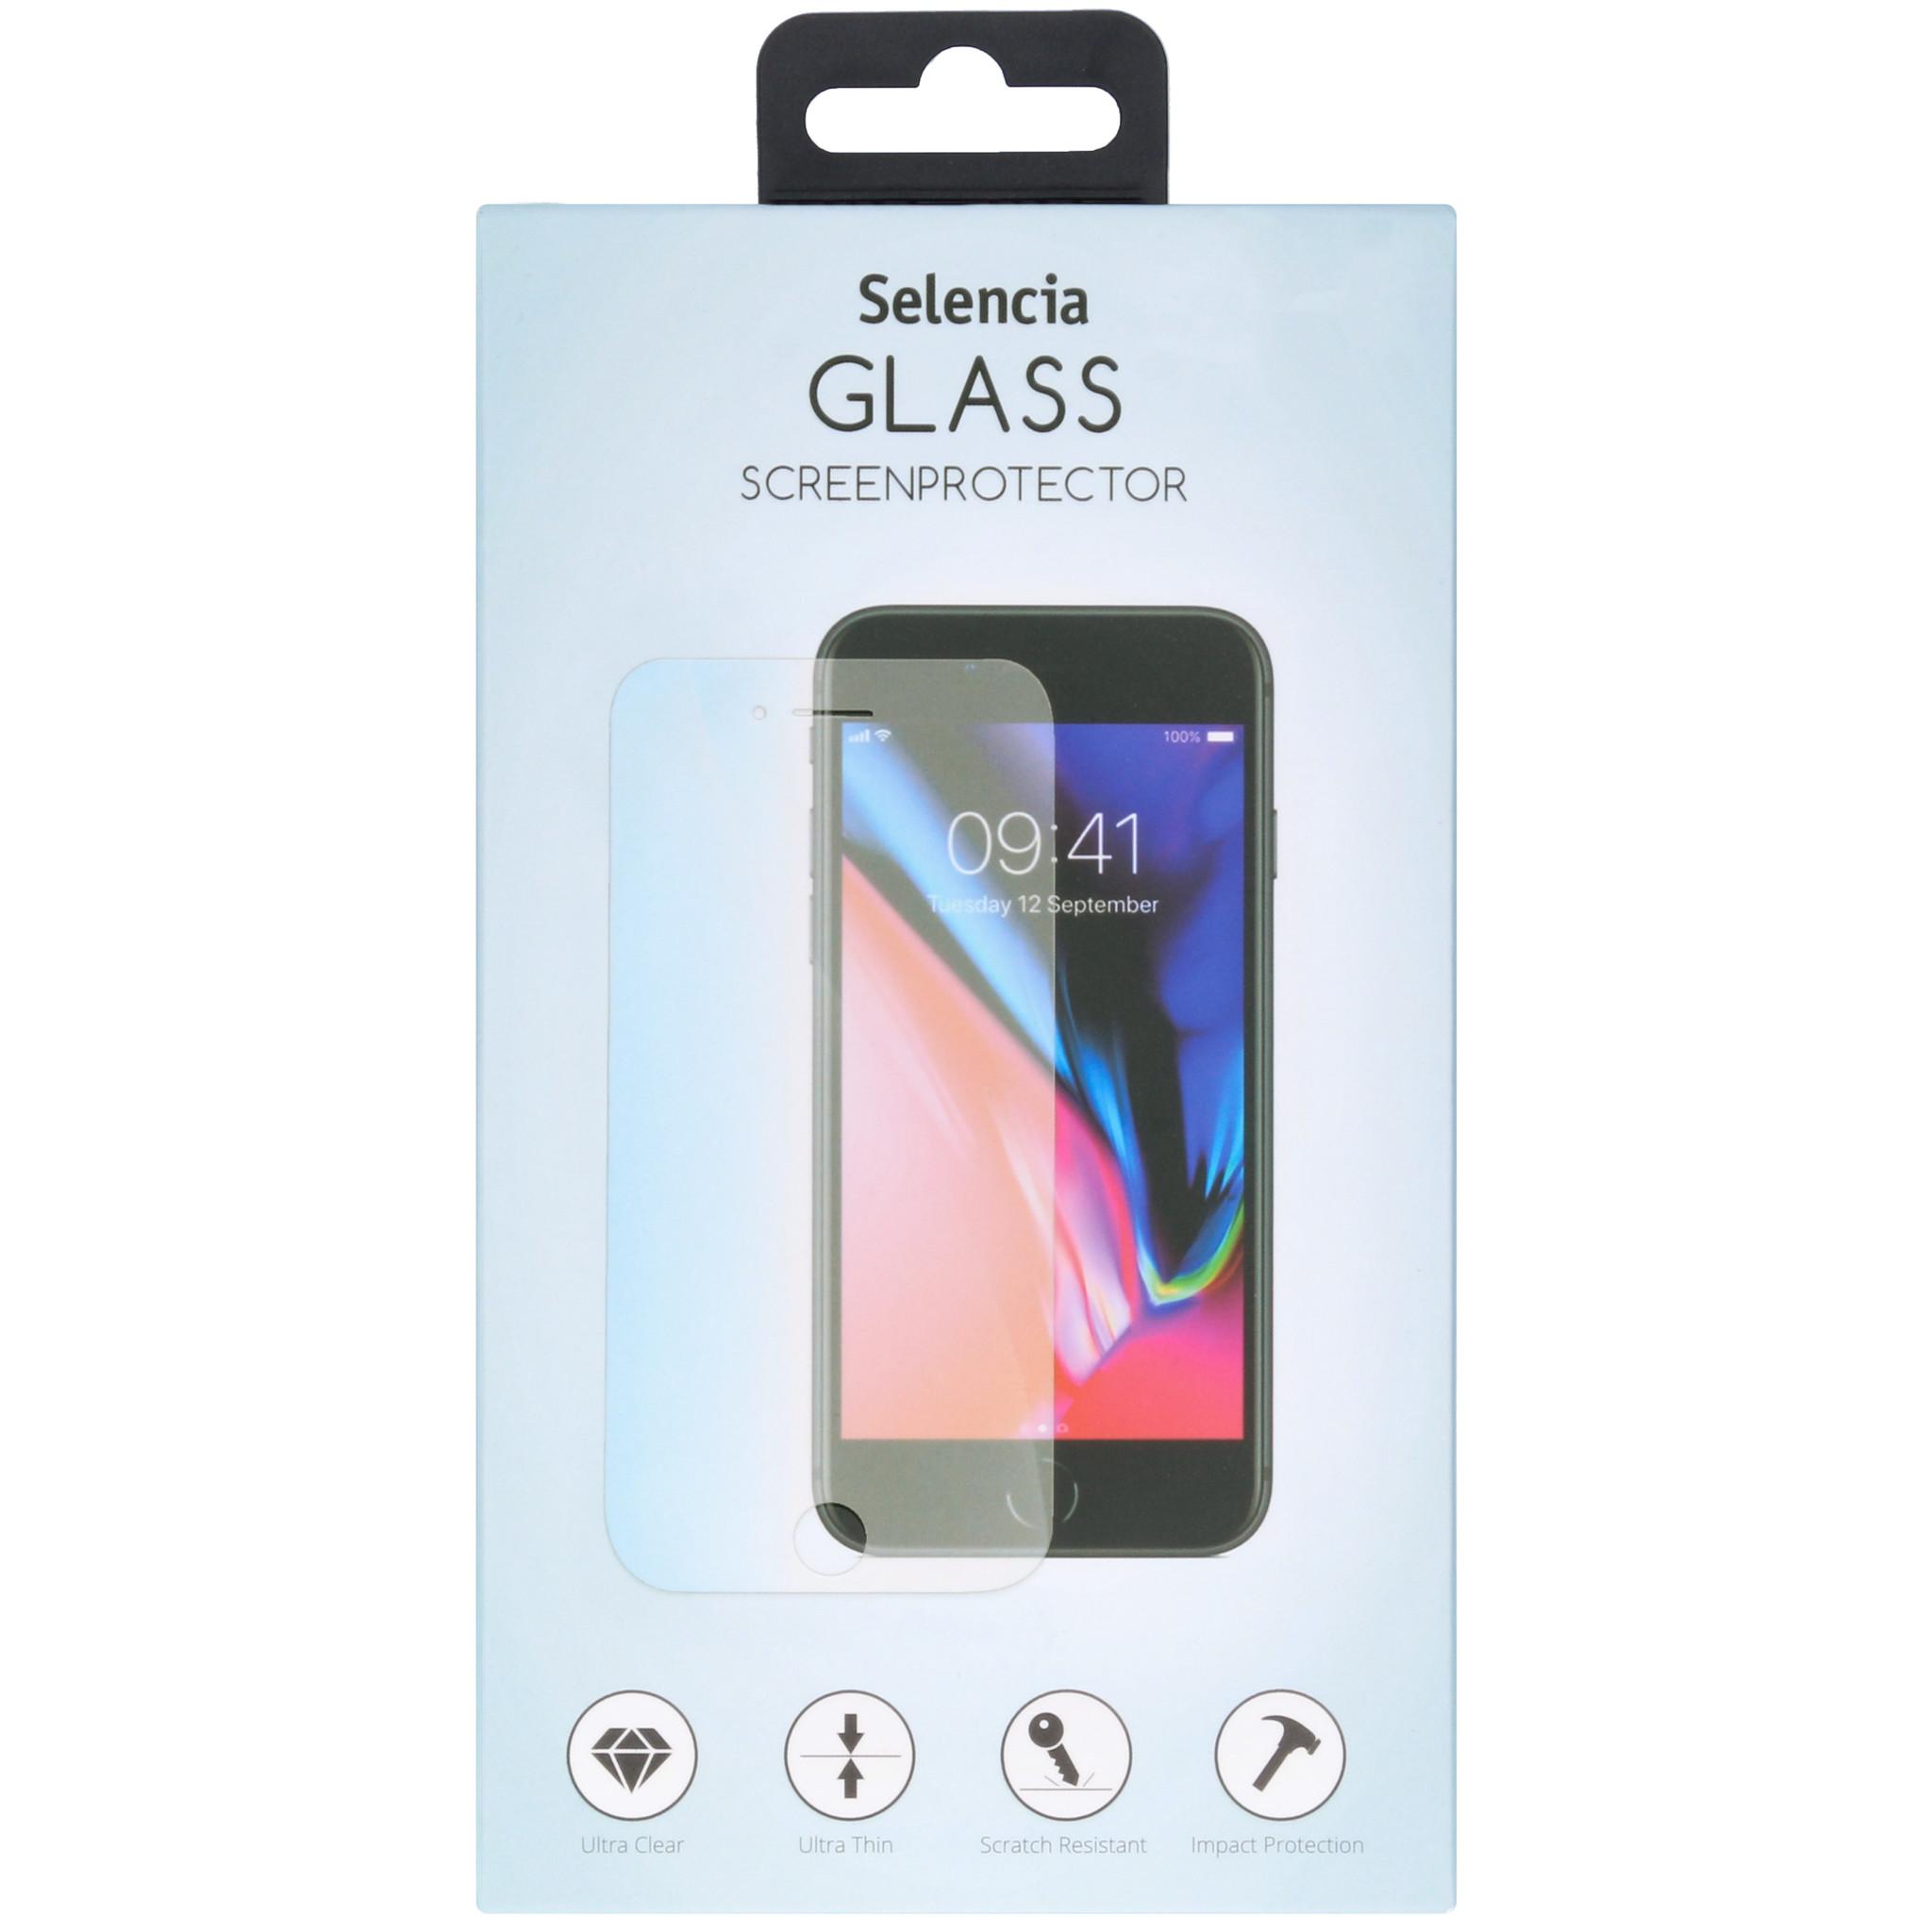 Selencia Gehard Glas Screenprotector iPhone 6(s) Plus